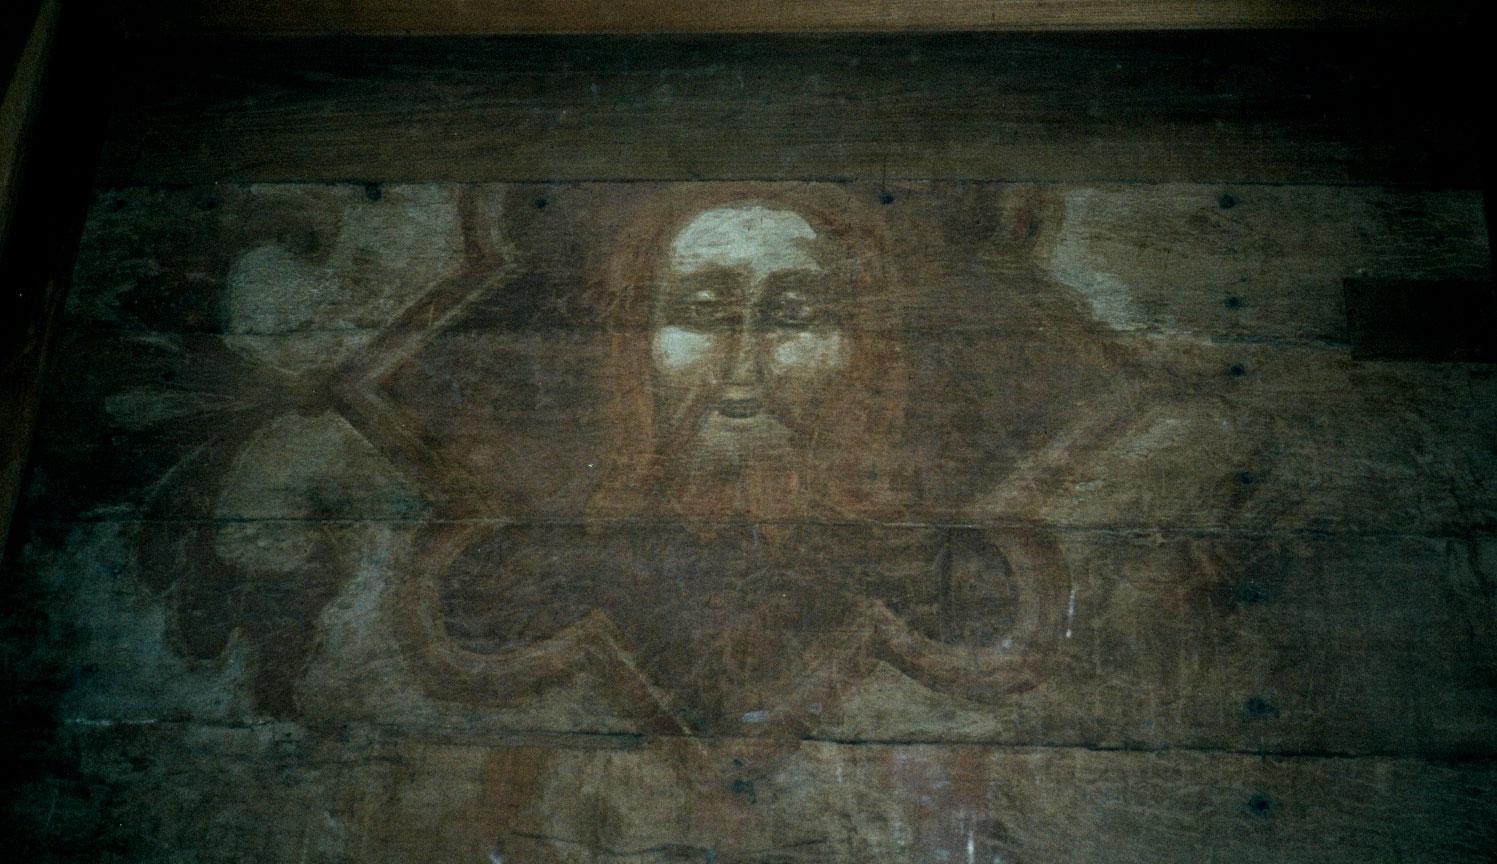 mysteries of the templars